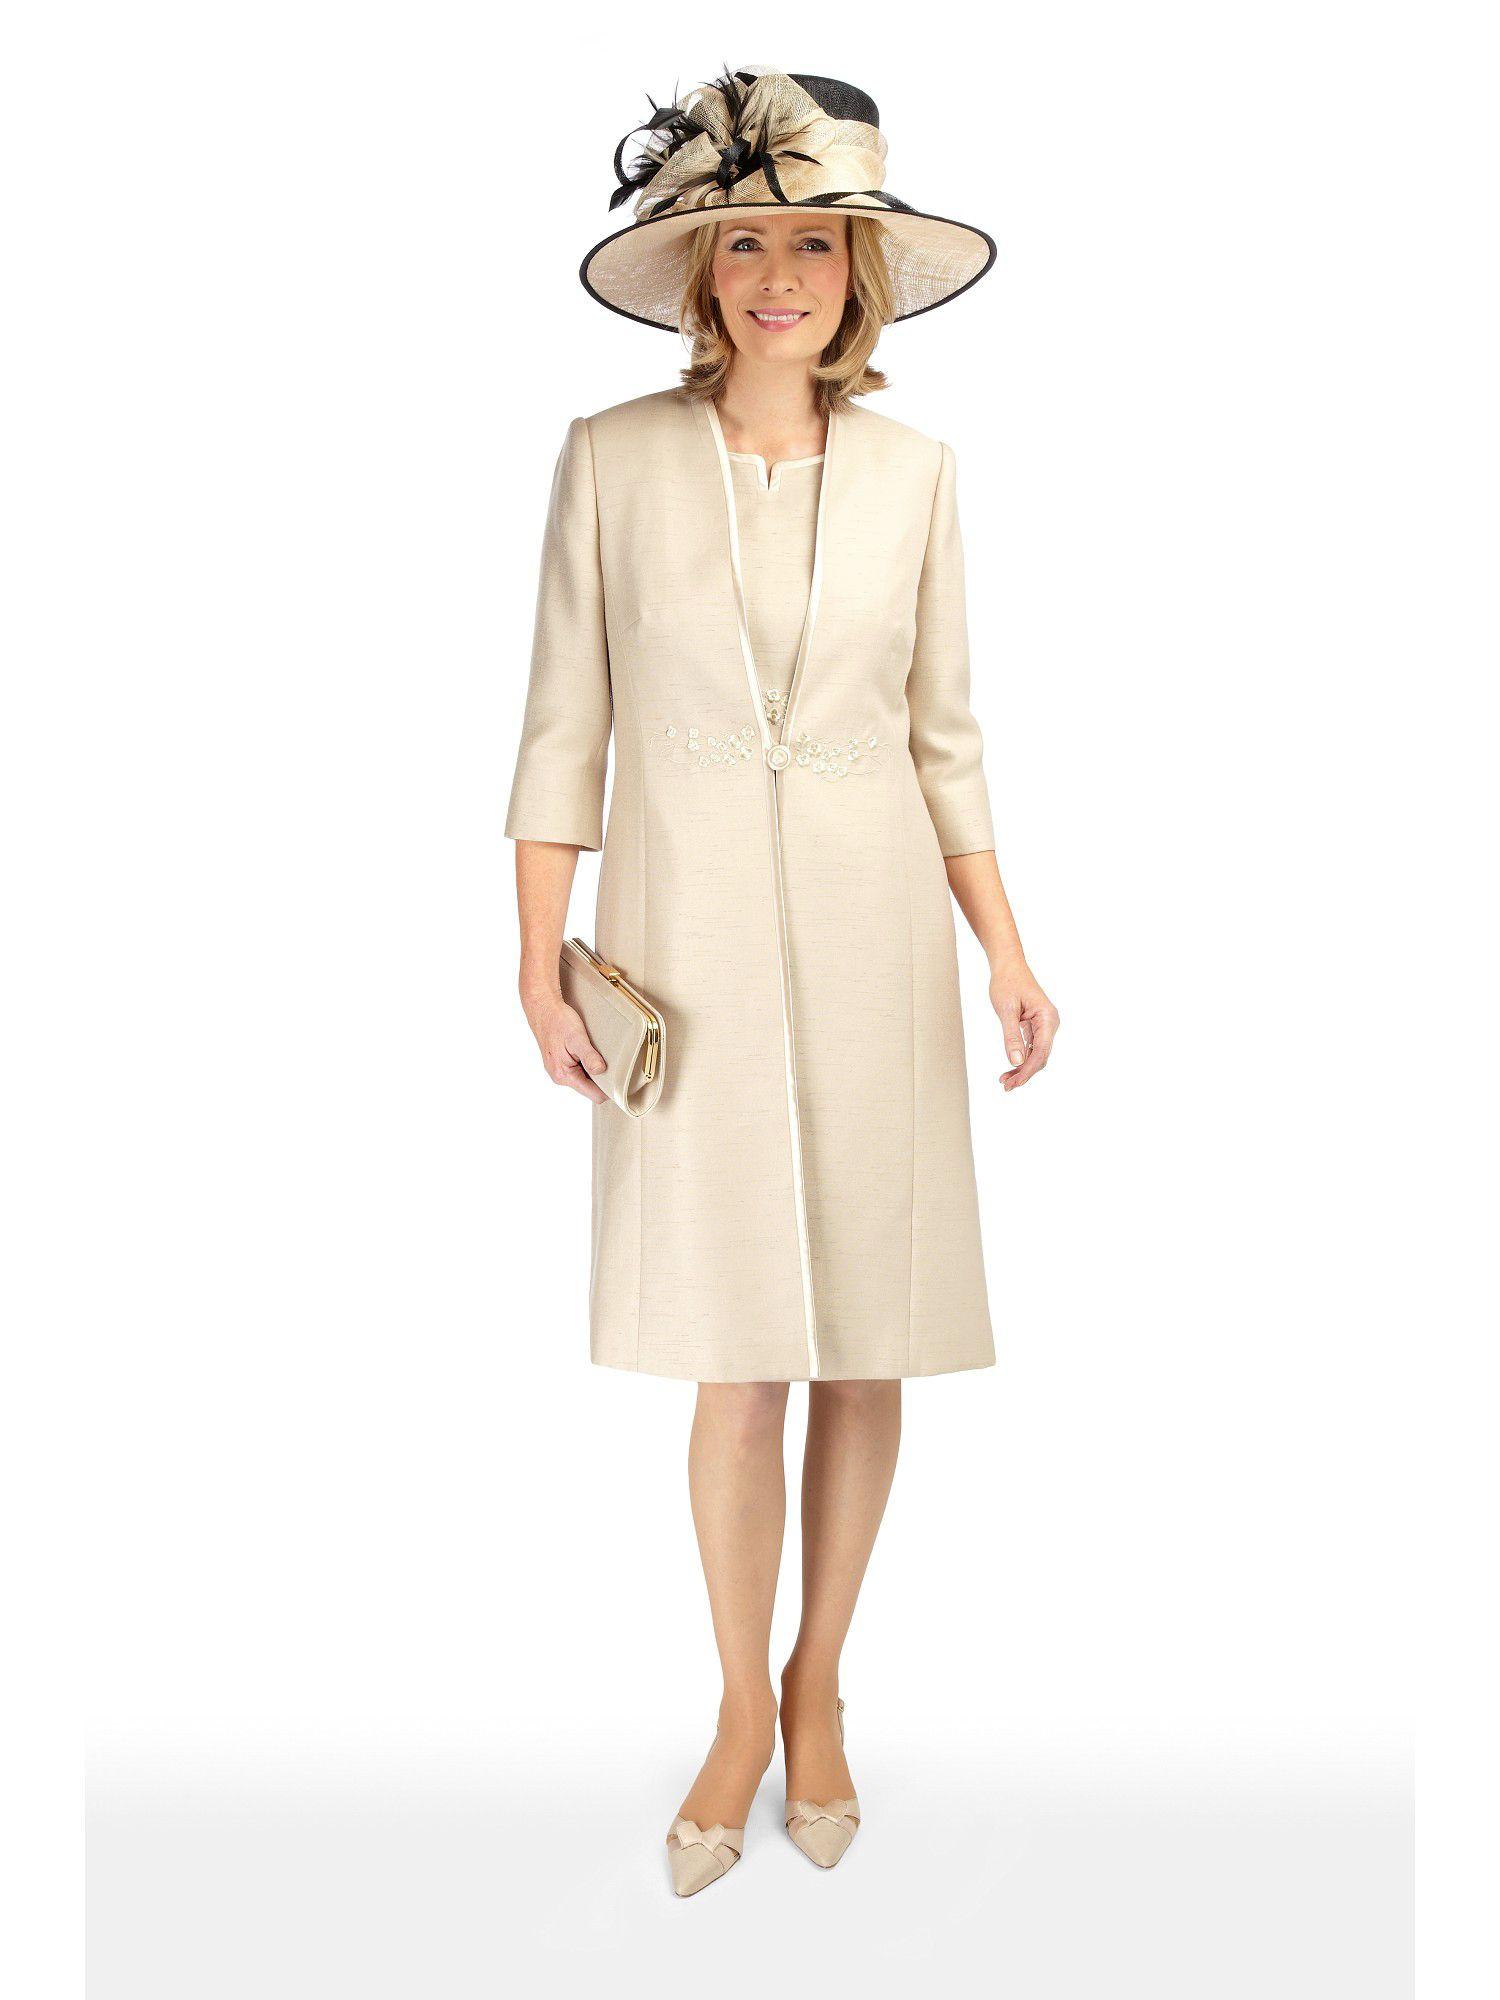 Jacques vert Sandstone Dress Coat in Natural   Lyst